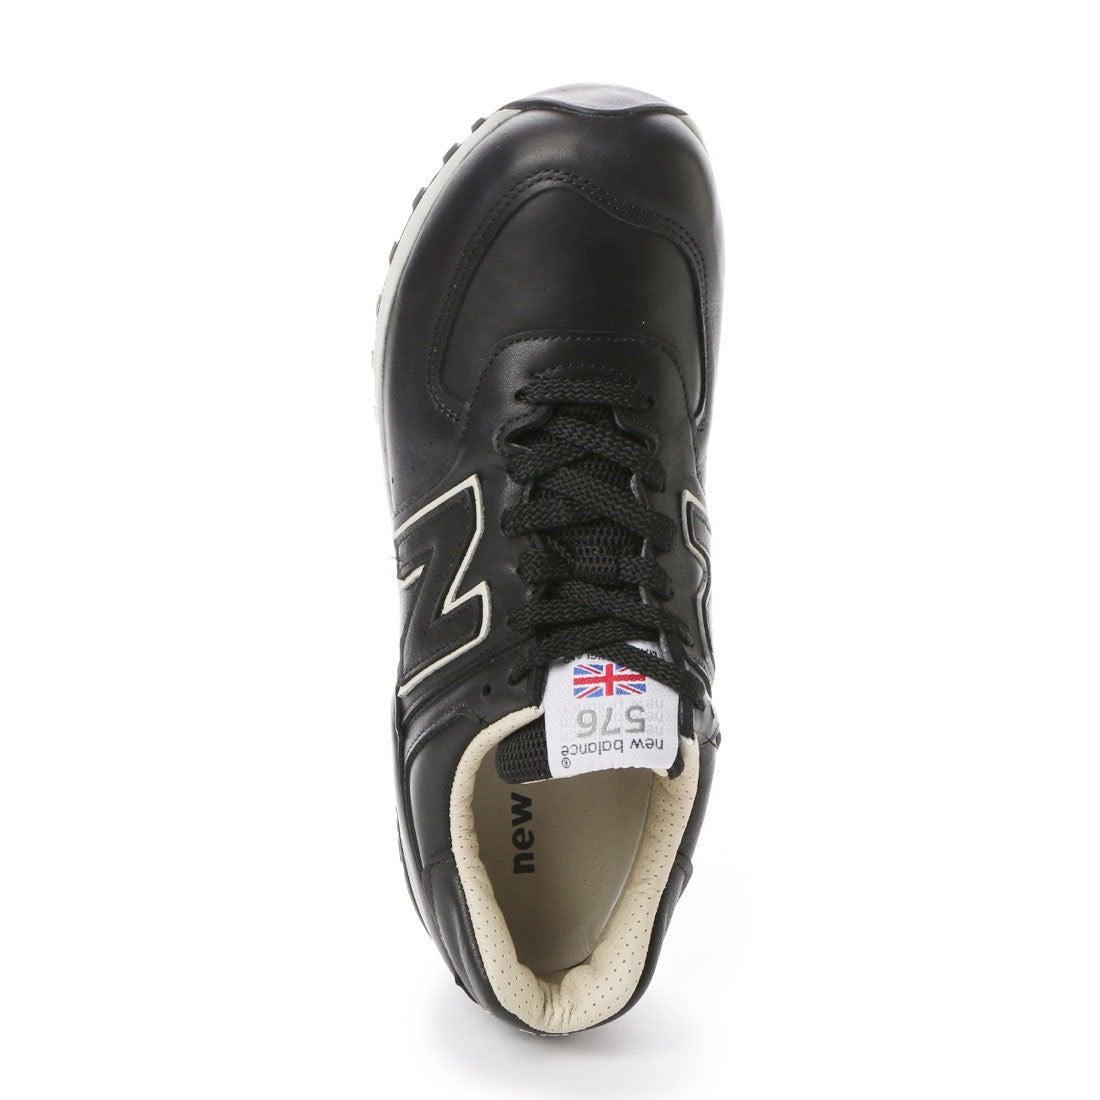 caba9f085ca65 ニューバランス new balance atmos M576 (CKK) ブラック/ベージュ -靴 ...